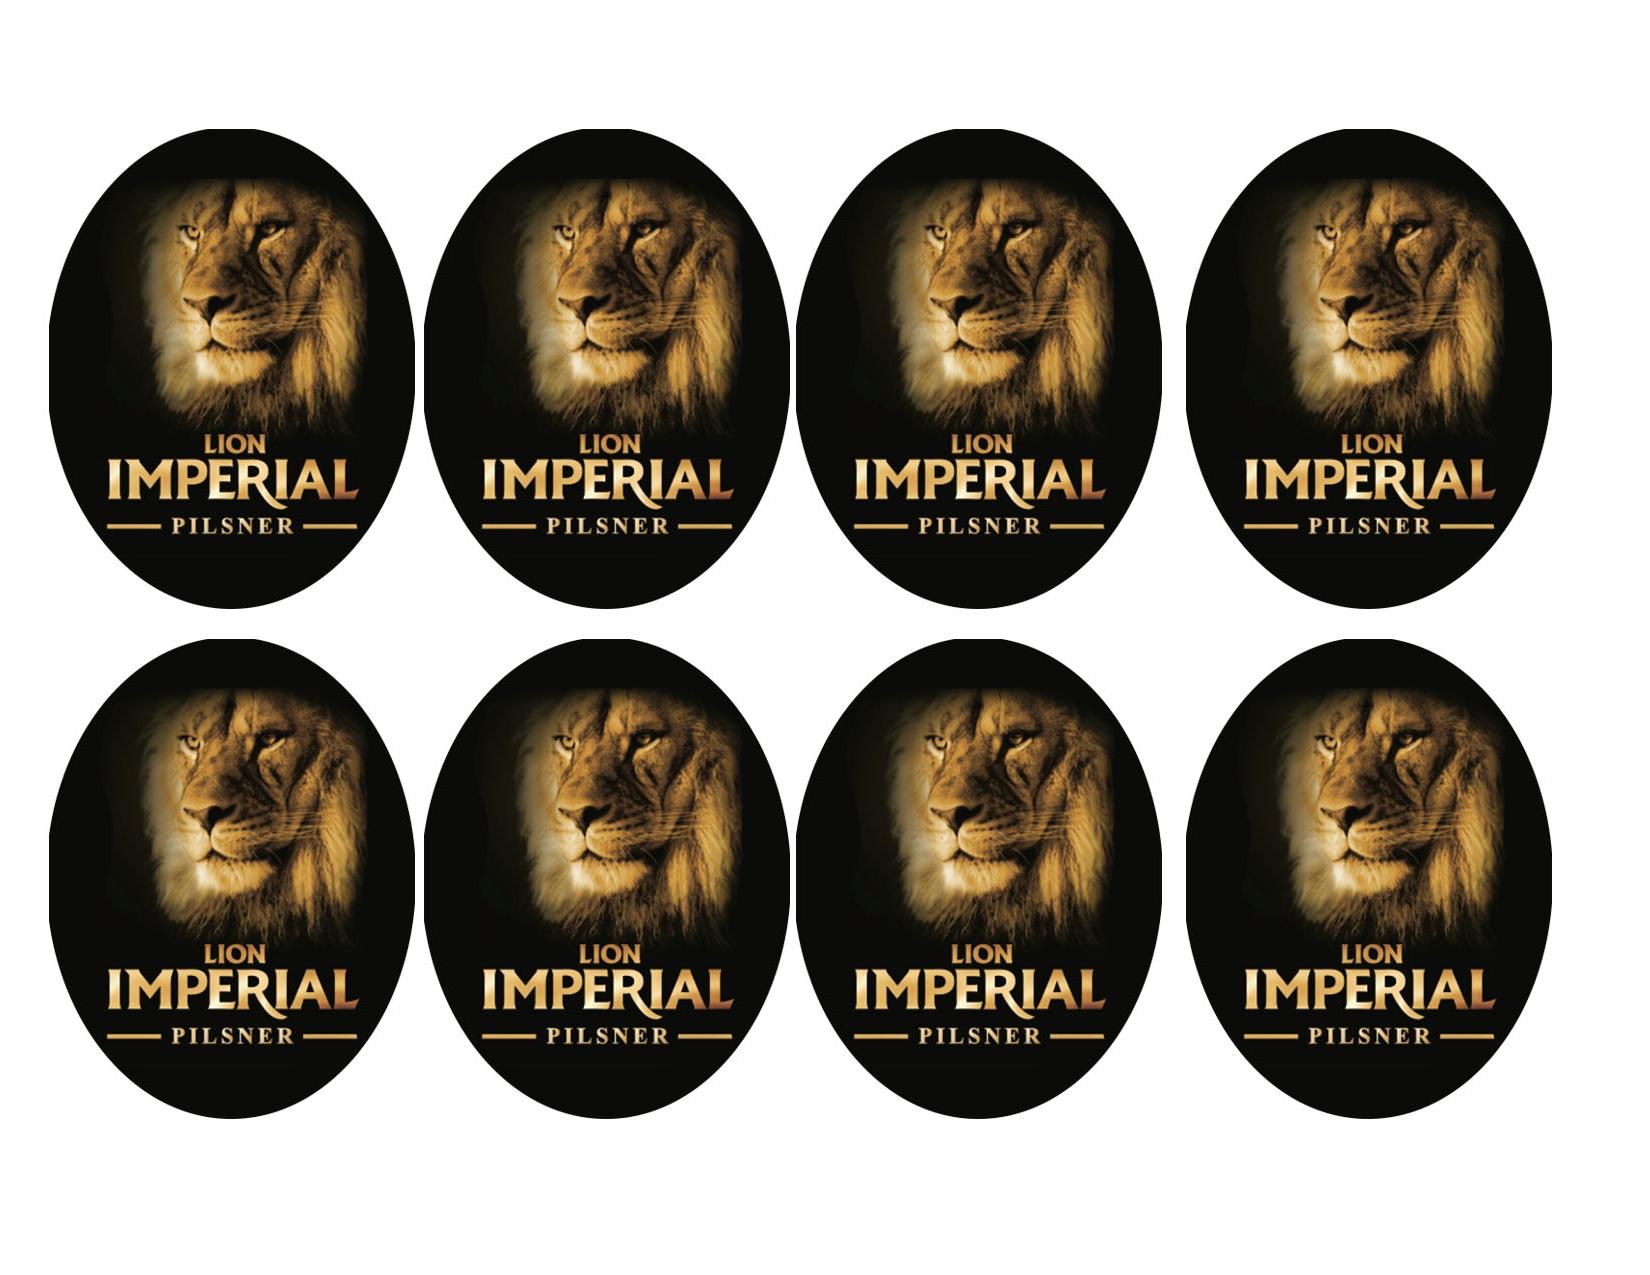 lion imperial pilsener pilsner sheet.jpg